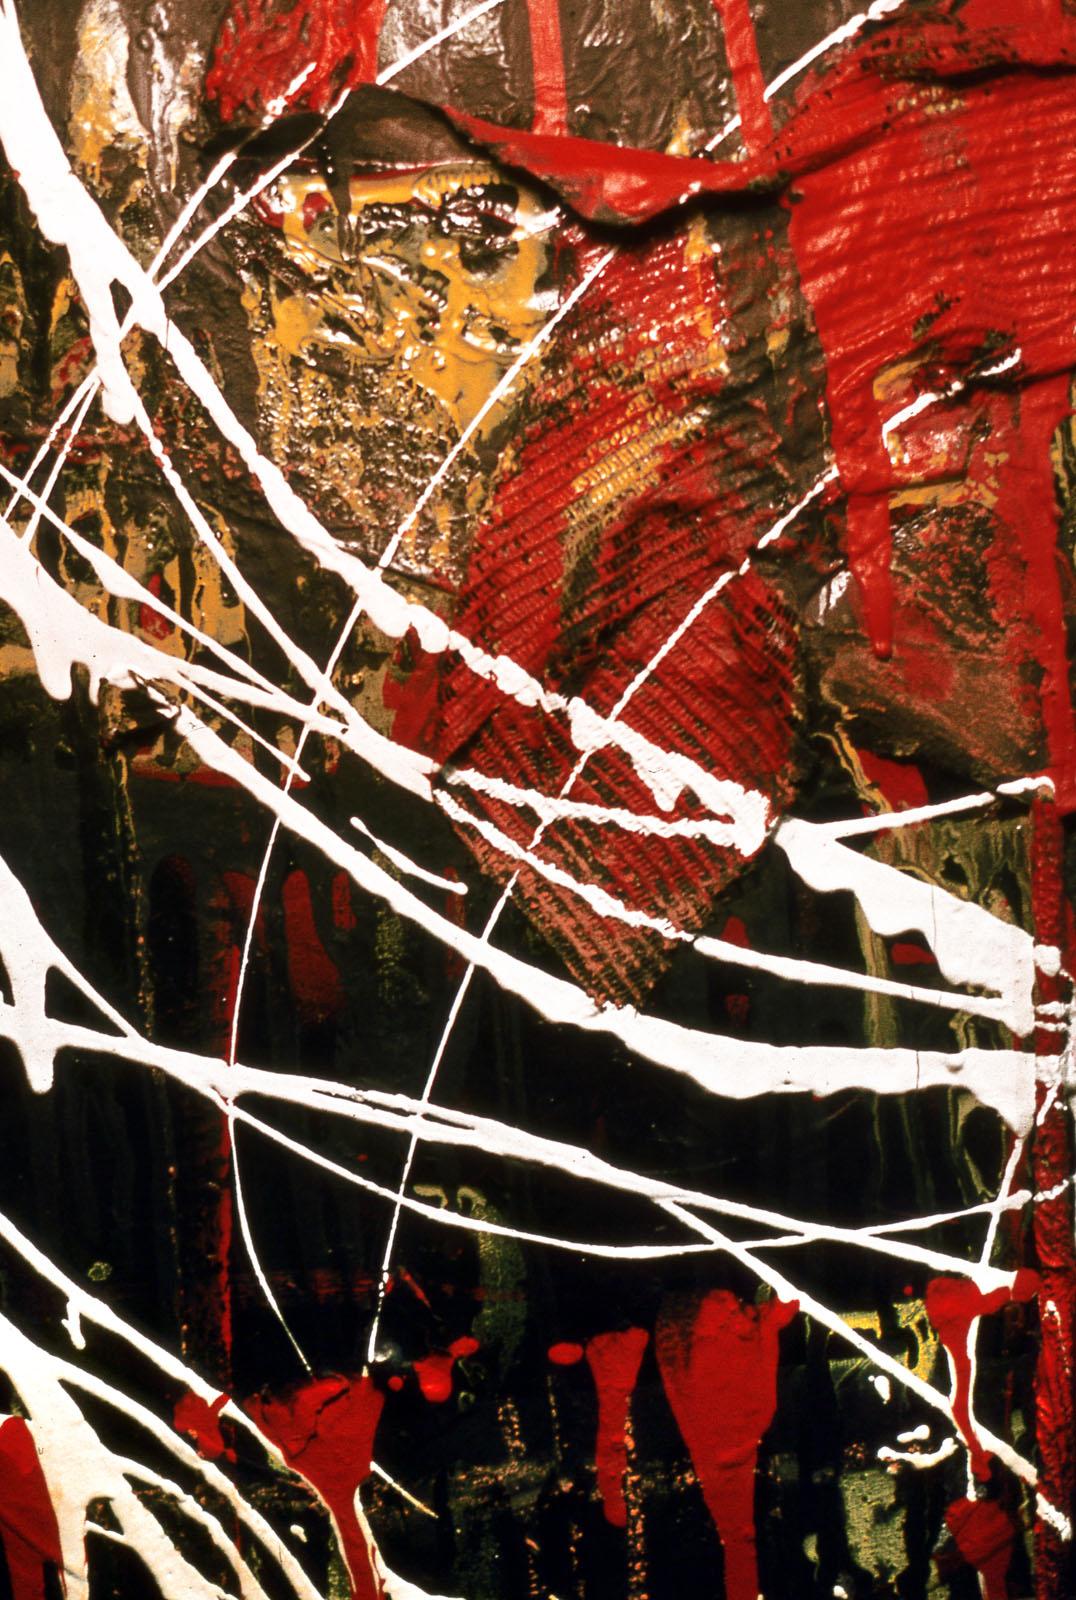 panies-danielvillalobos-spanish-painting-abstractexpressionism-15